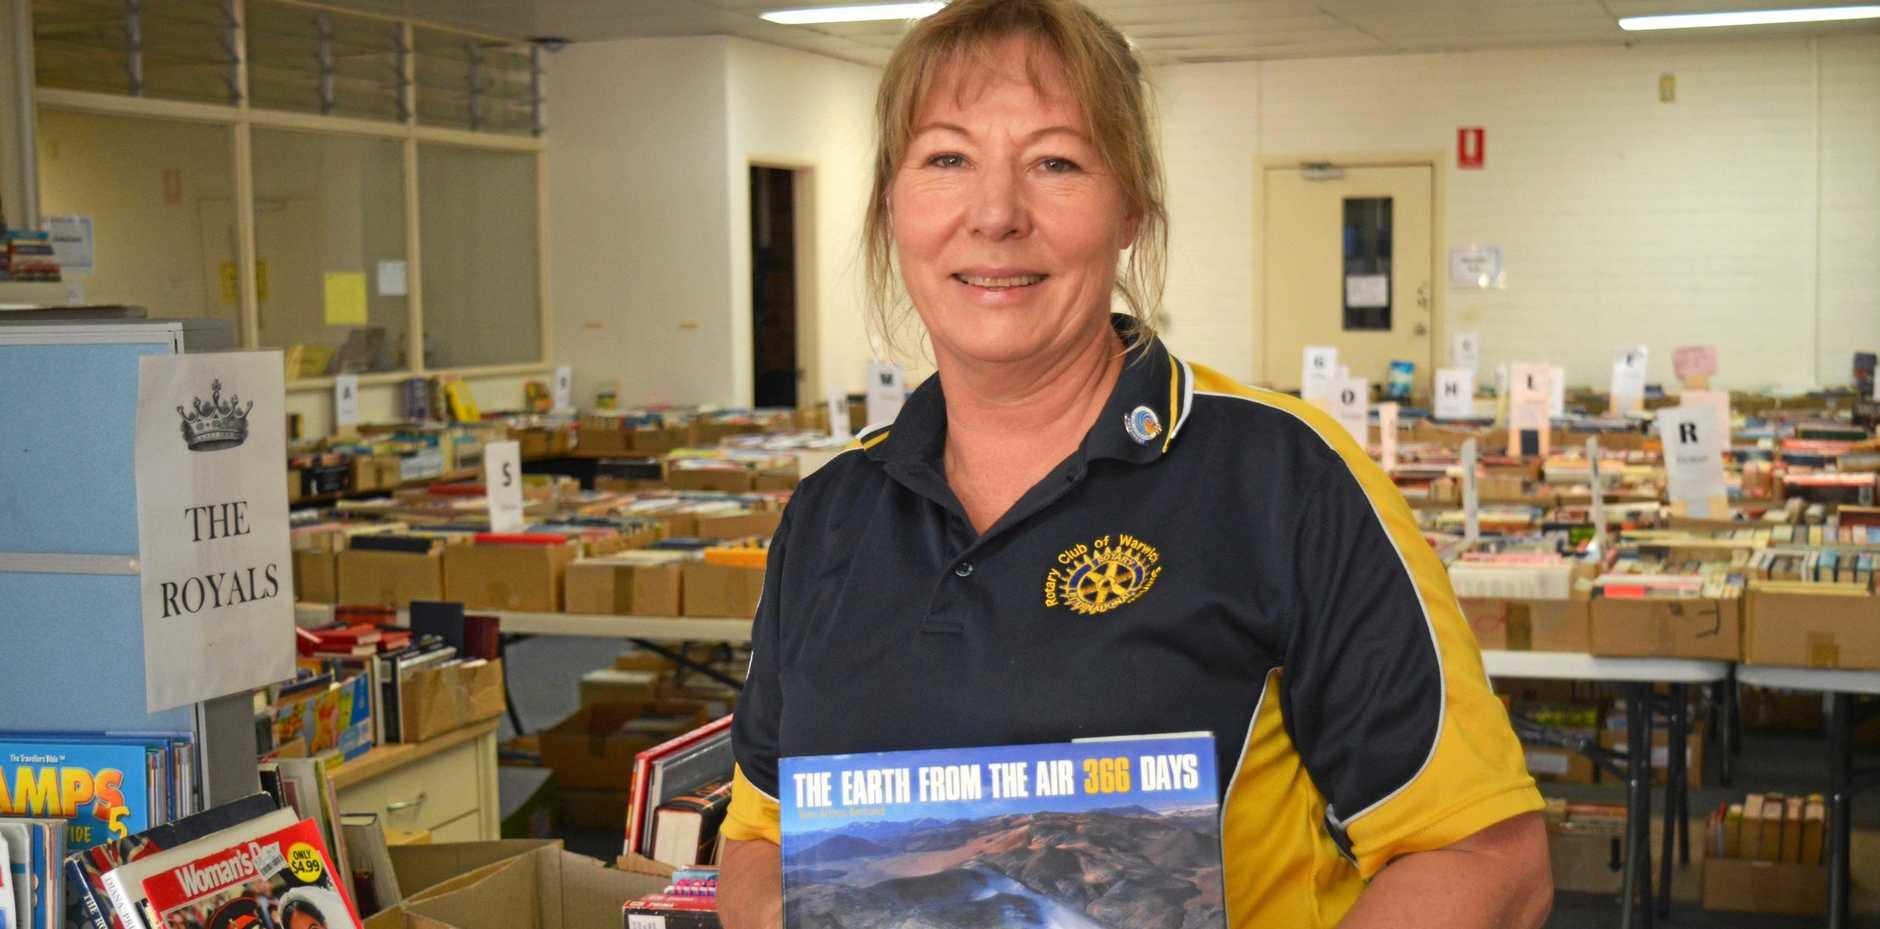 Rotary Club of Warwick Sunrise president Laureen Vanderwolf loves books.